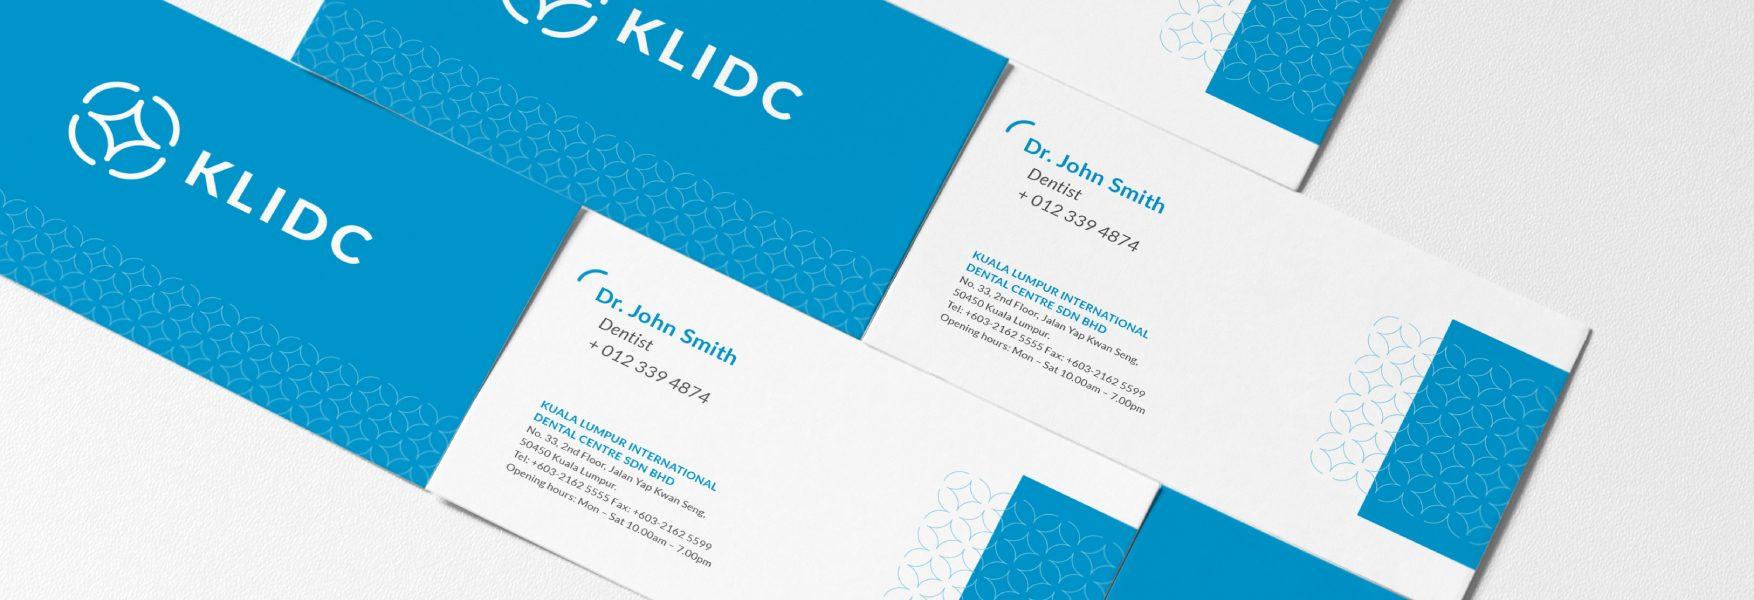 KLIDC-Branding-Mockup-05